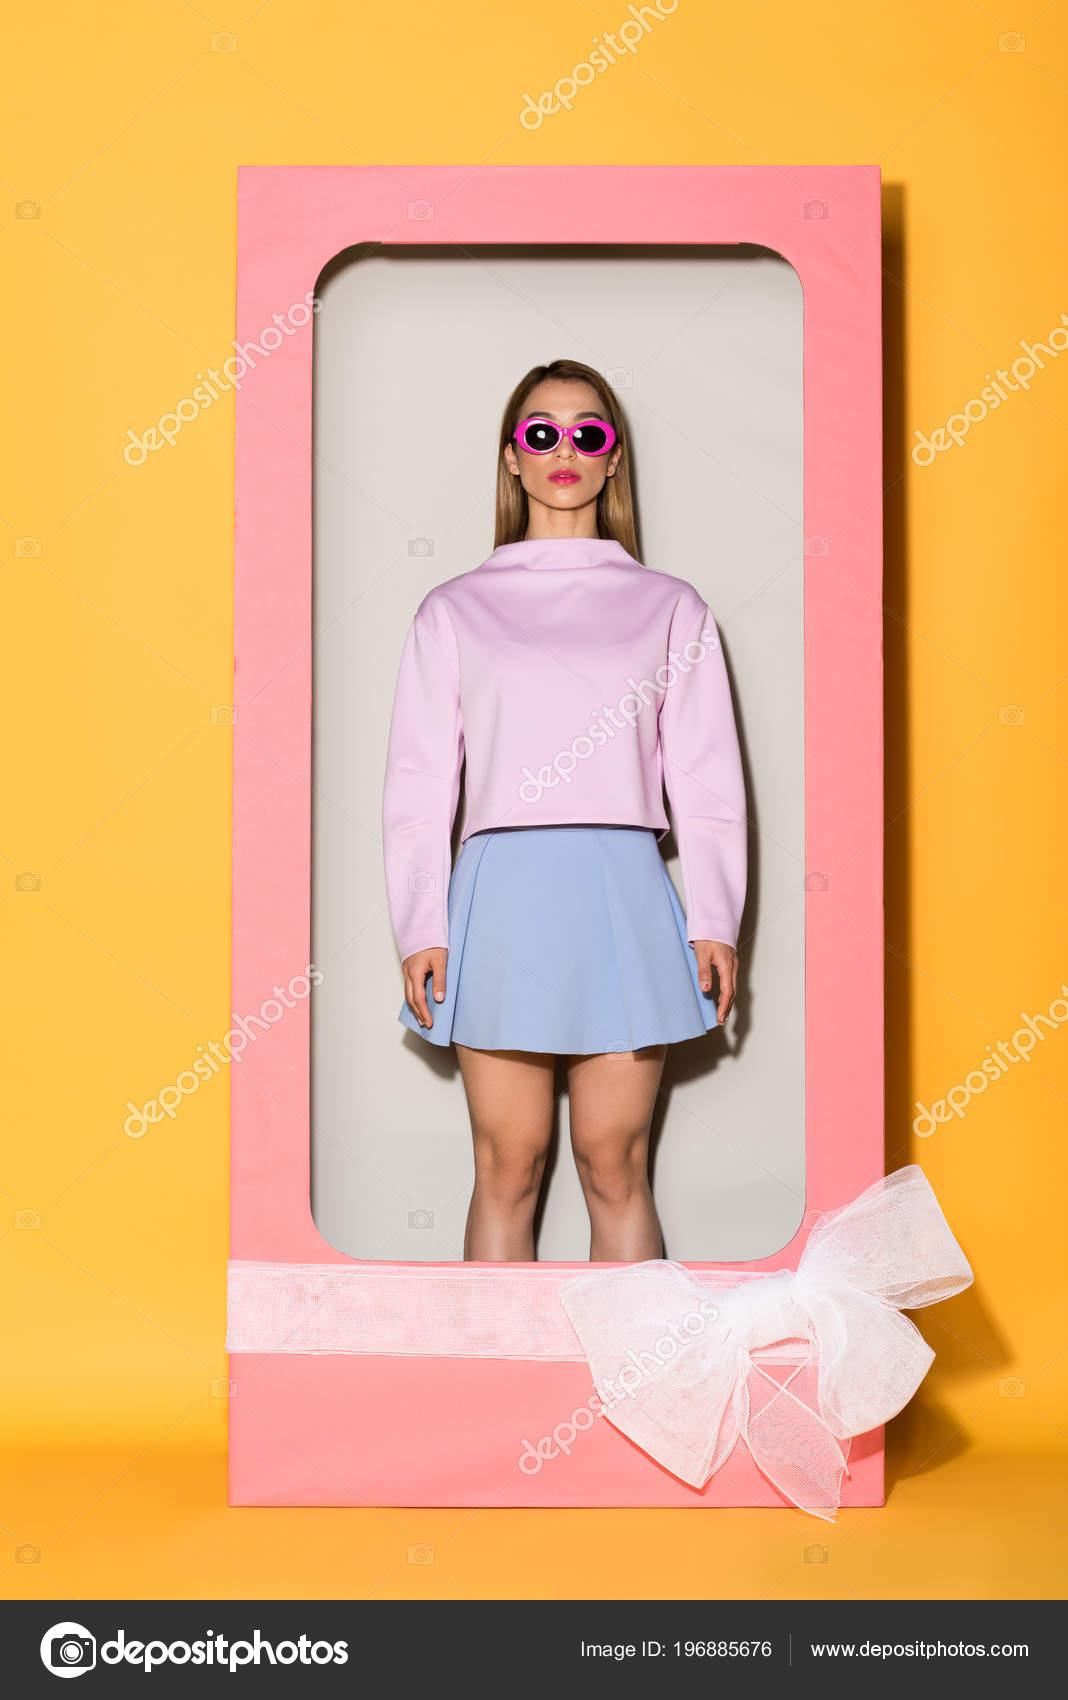 e265638749 Νέοι κομψό γυναικείο πρότυπο για γυαλιά ηλίου σε διακοσμητικό κουτί με  φιόγκο σε κίτρινο φόντο — Εικόνα από ...